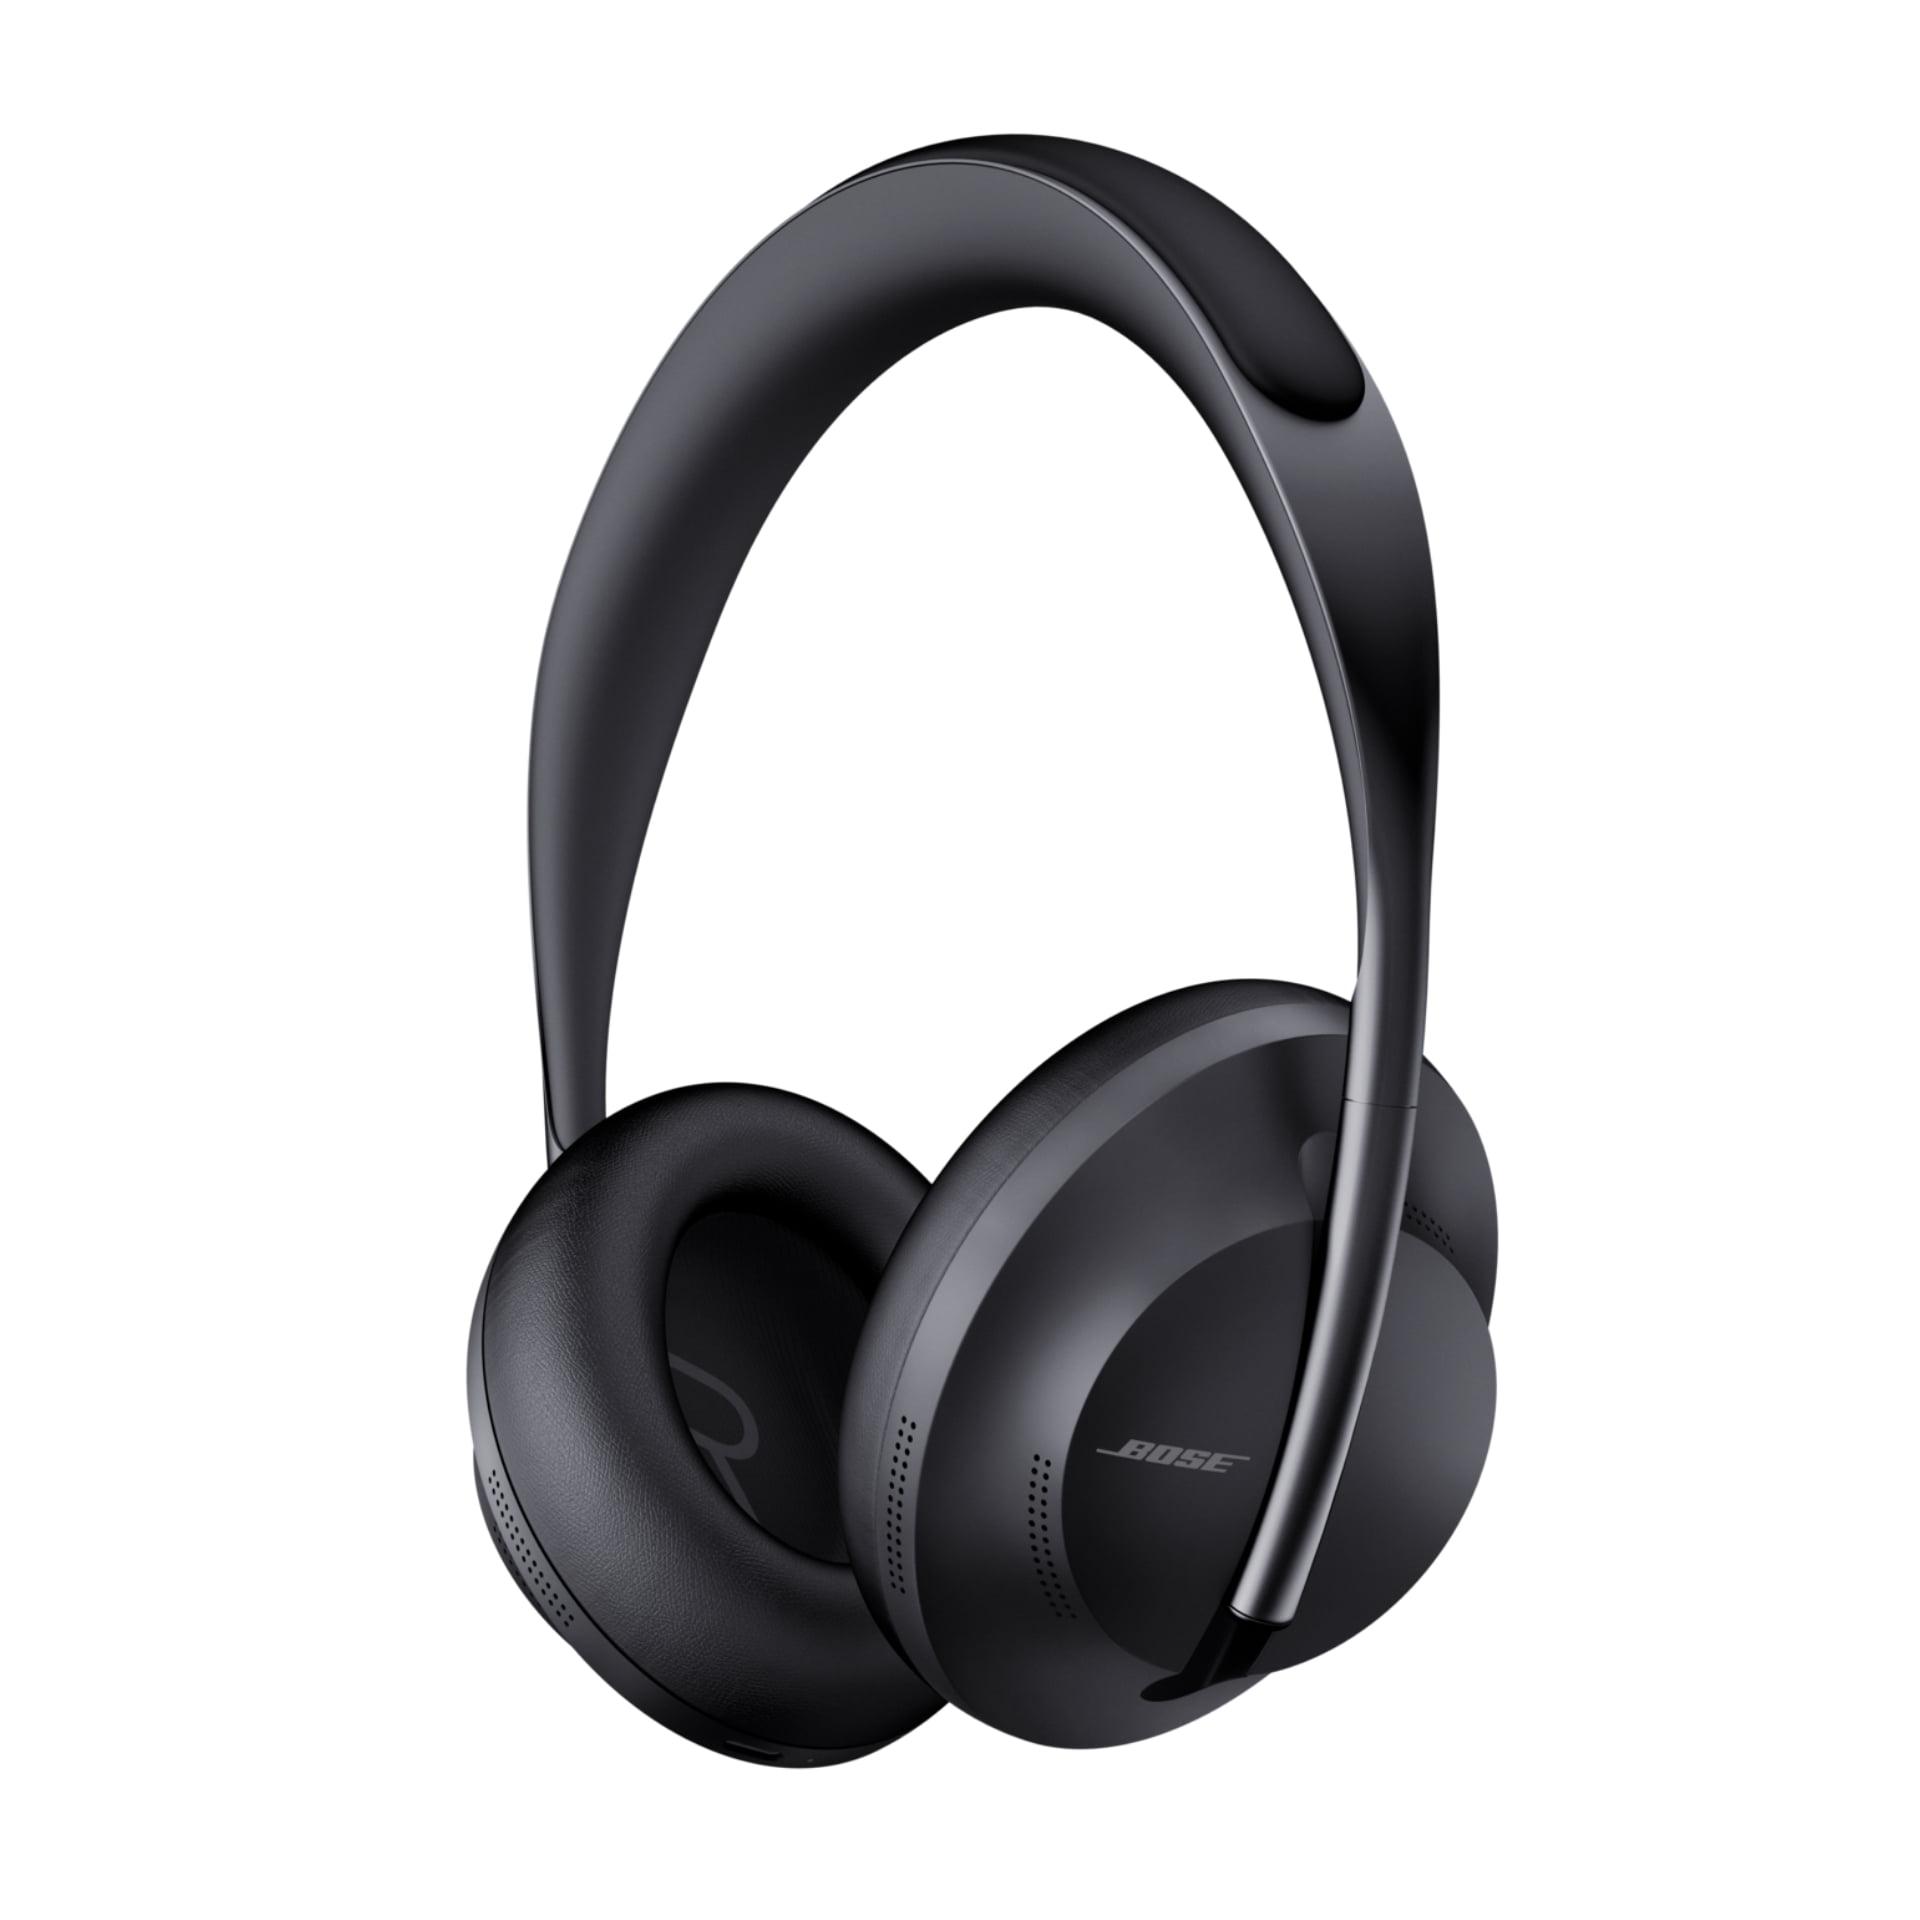 Bose Noise Cancelling Wireless Headphones 700 Black Walmart Com Walmart Com